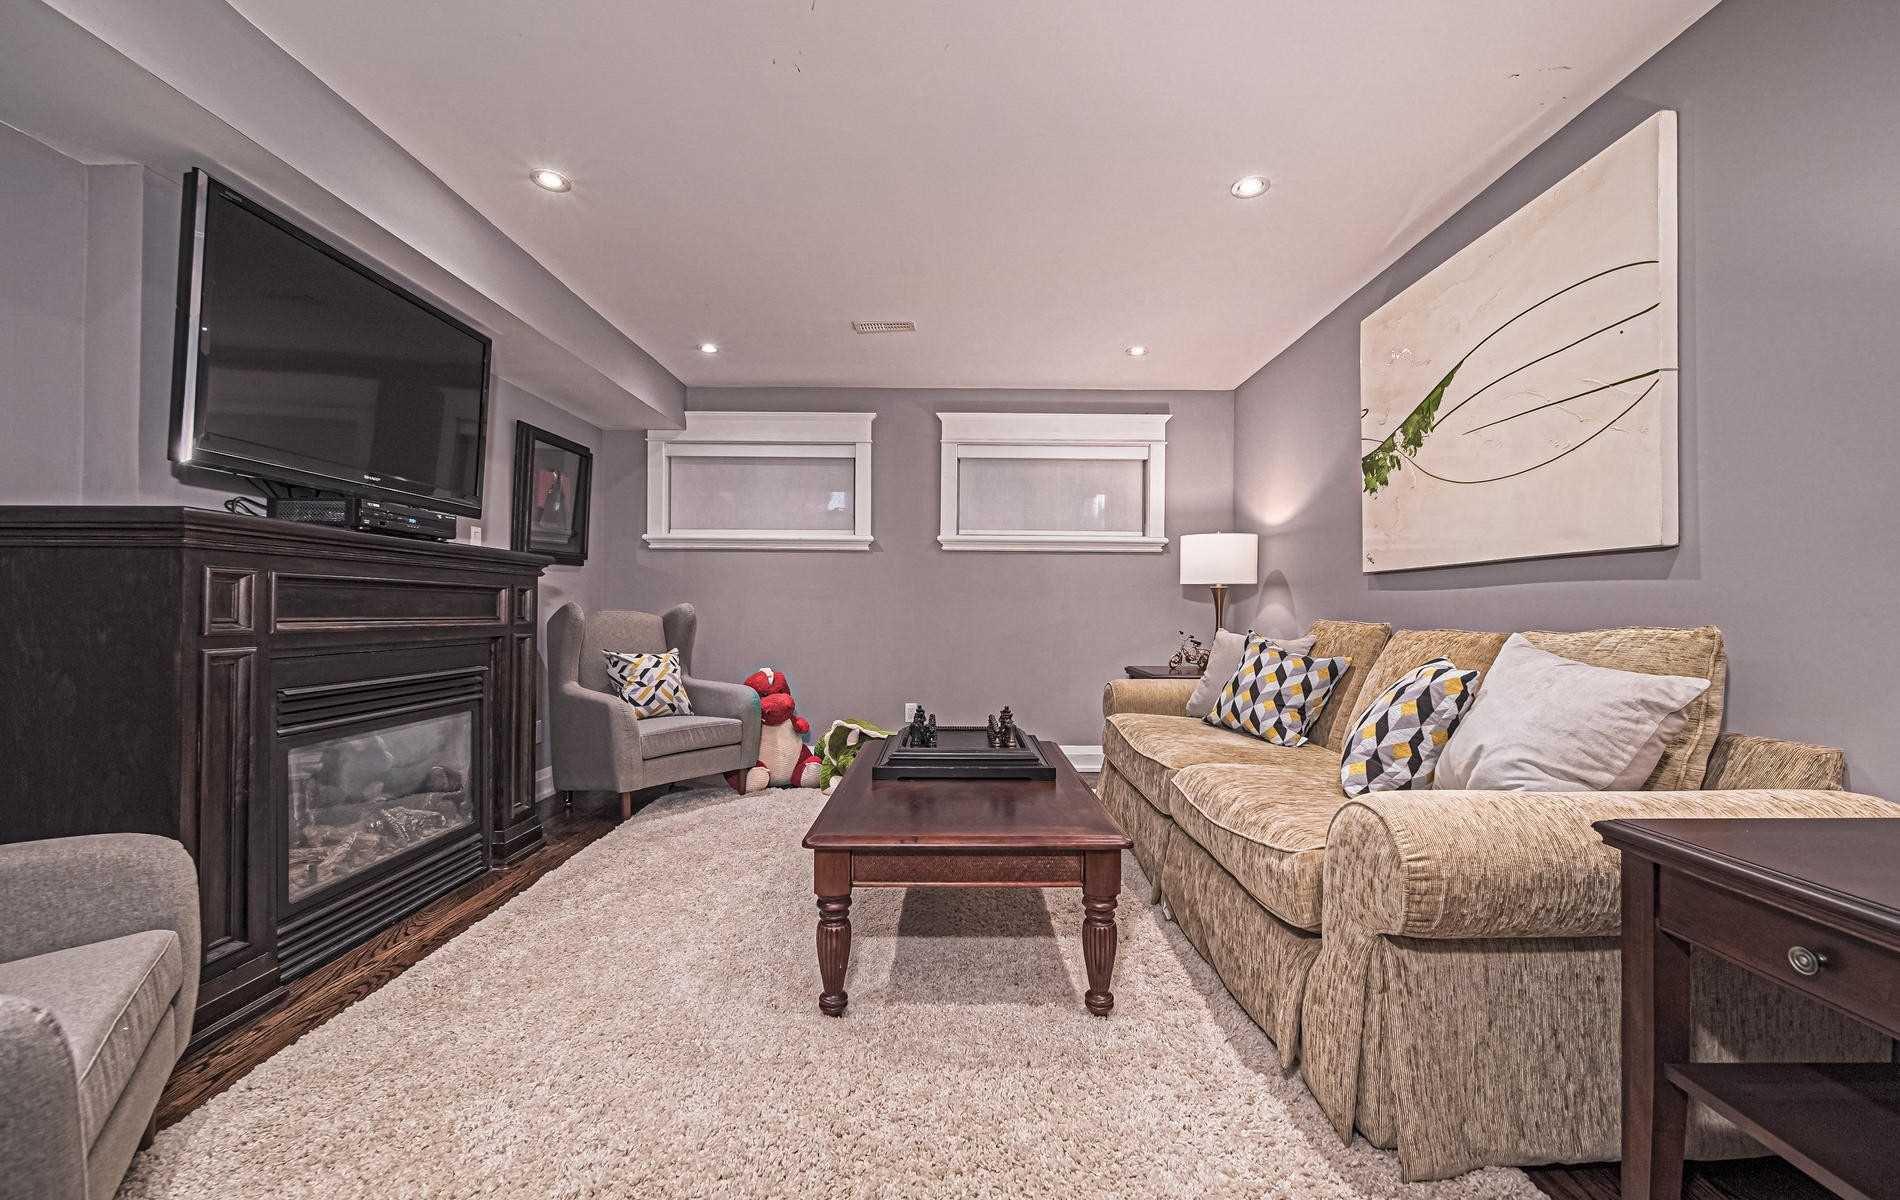 Photo 17: Photos: 216A Hamilton Street in Toronto: South Riverdale House (3-Storey) for sale (Toronto E01)  : MLS®# E4619870